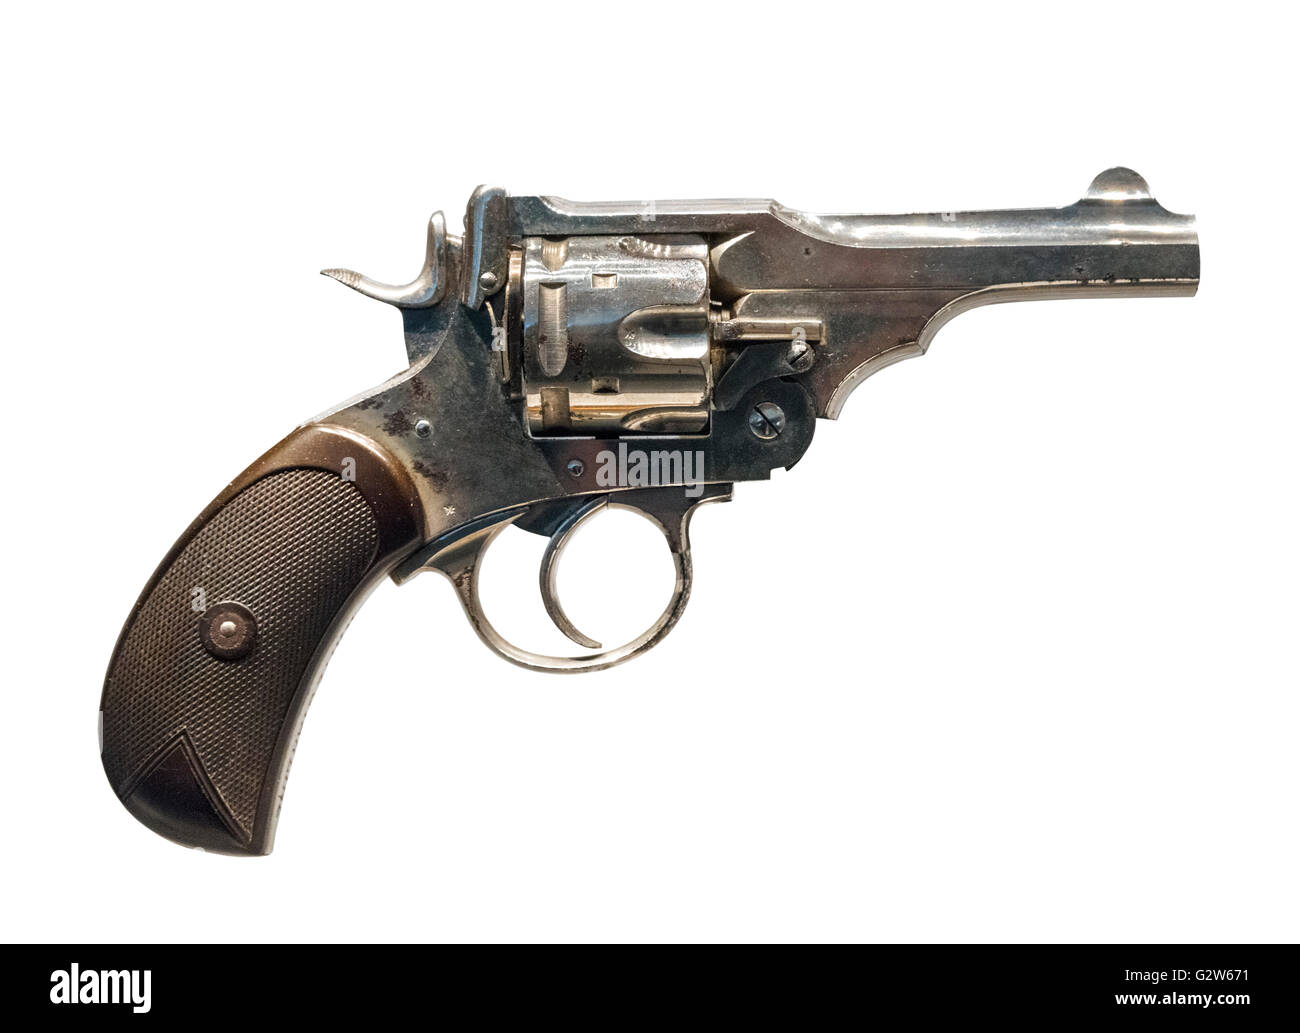 Webley Mark IV Revolver, 1899-1913 - Stock Image